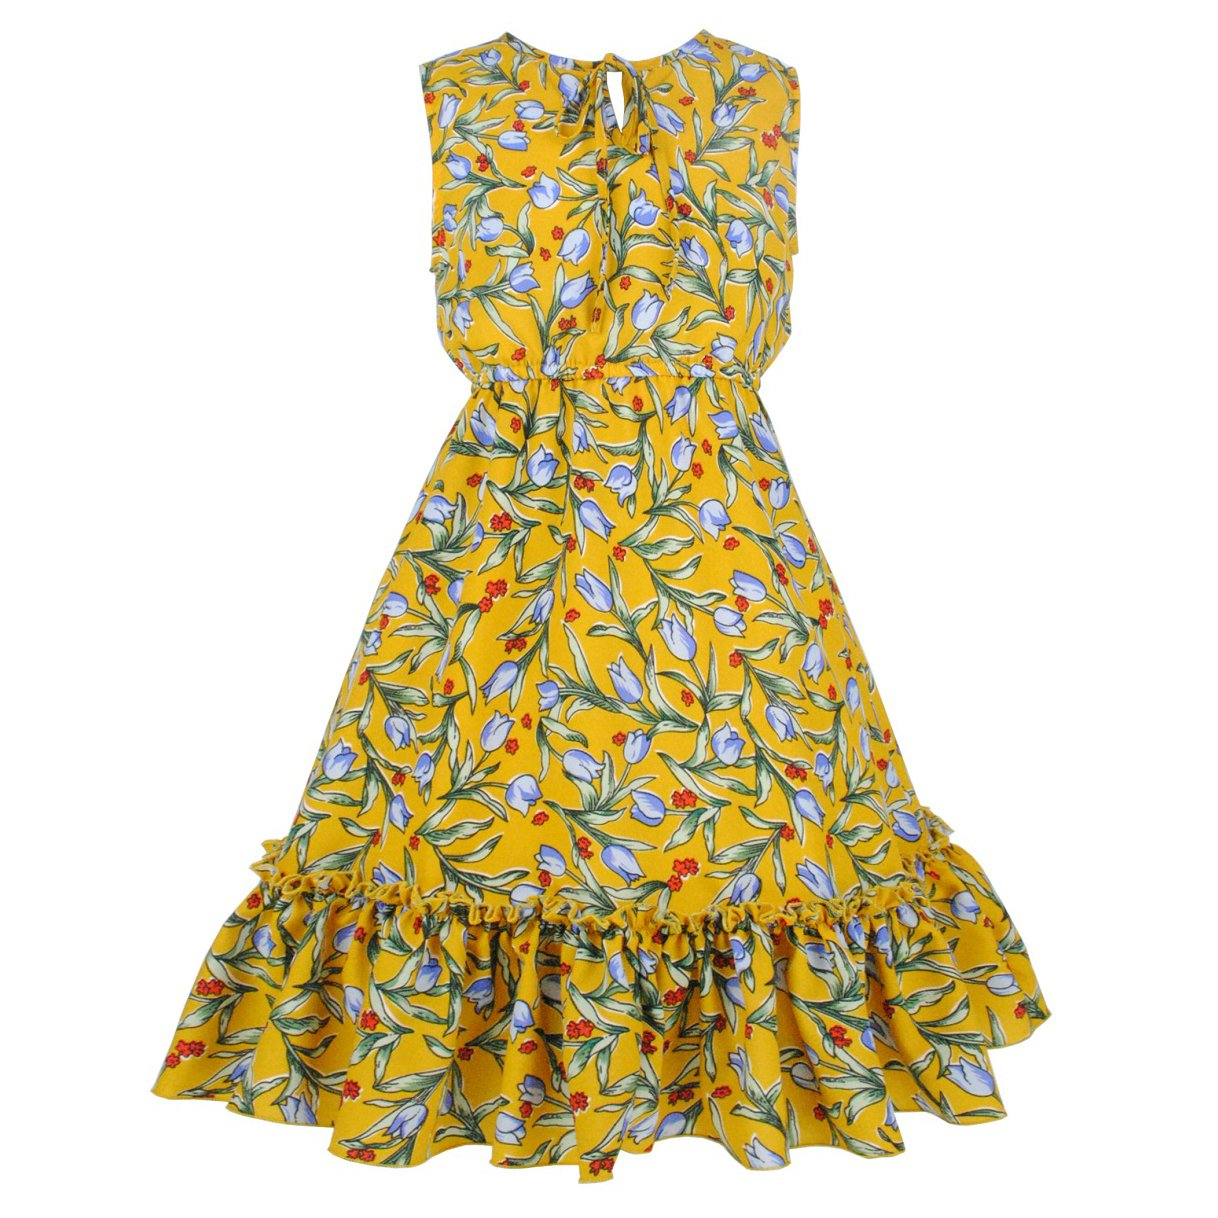 HCABL Girls Floral Dress Summer Sleeveless Beach Sundress Casual Party 3-13T